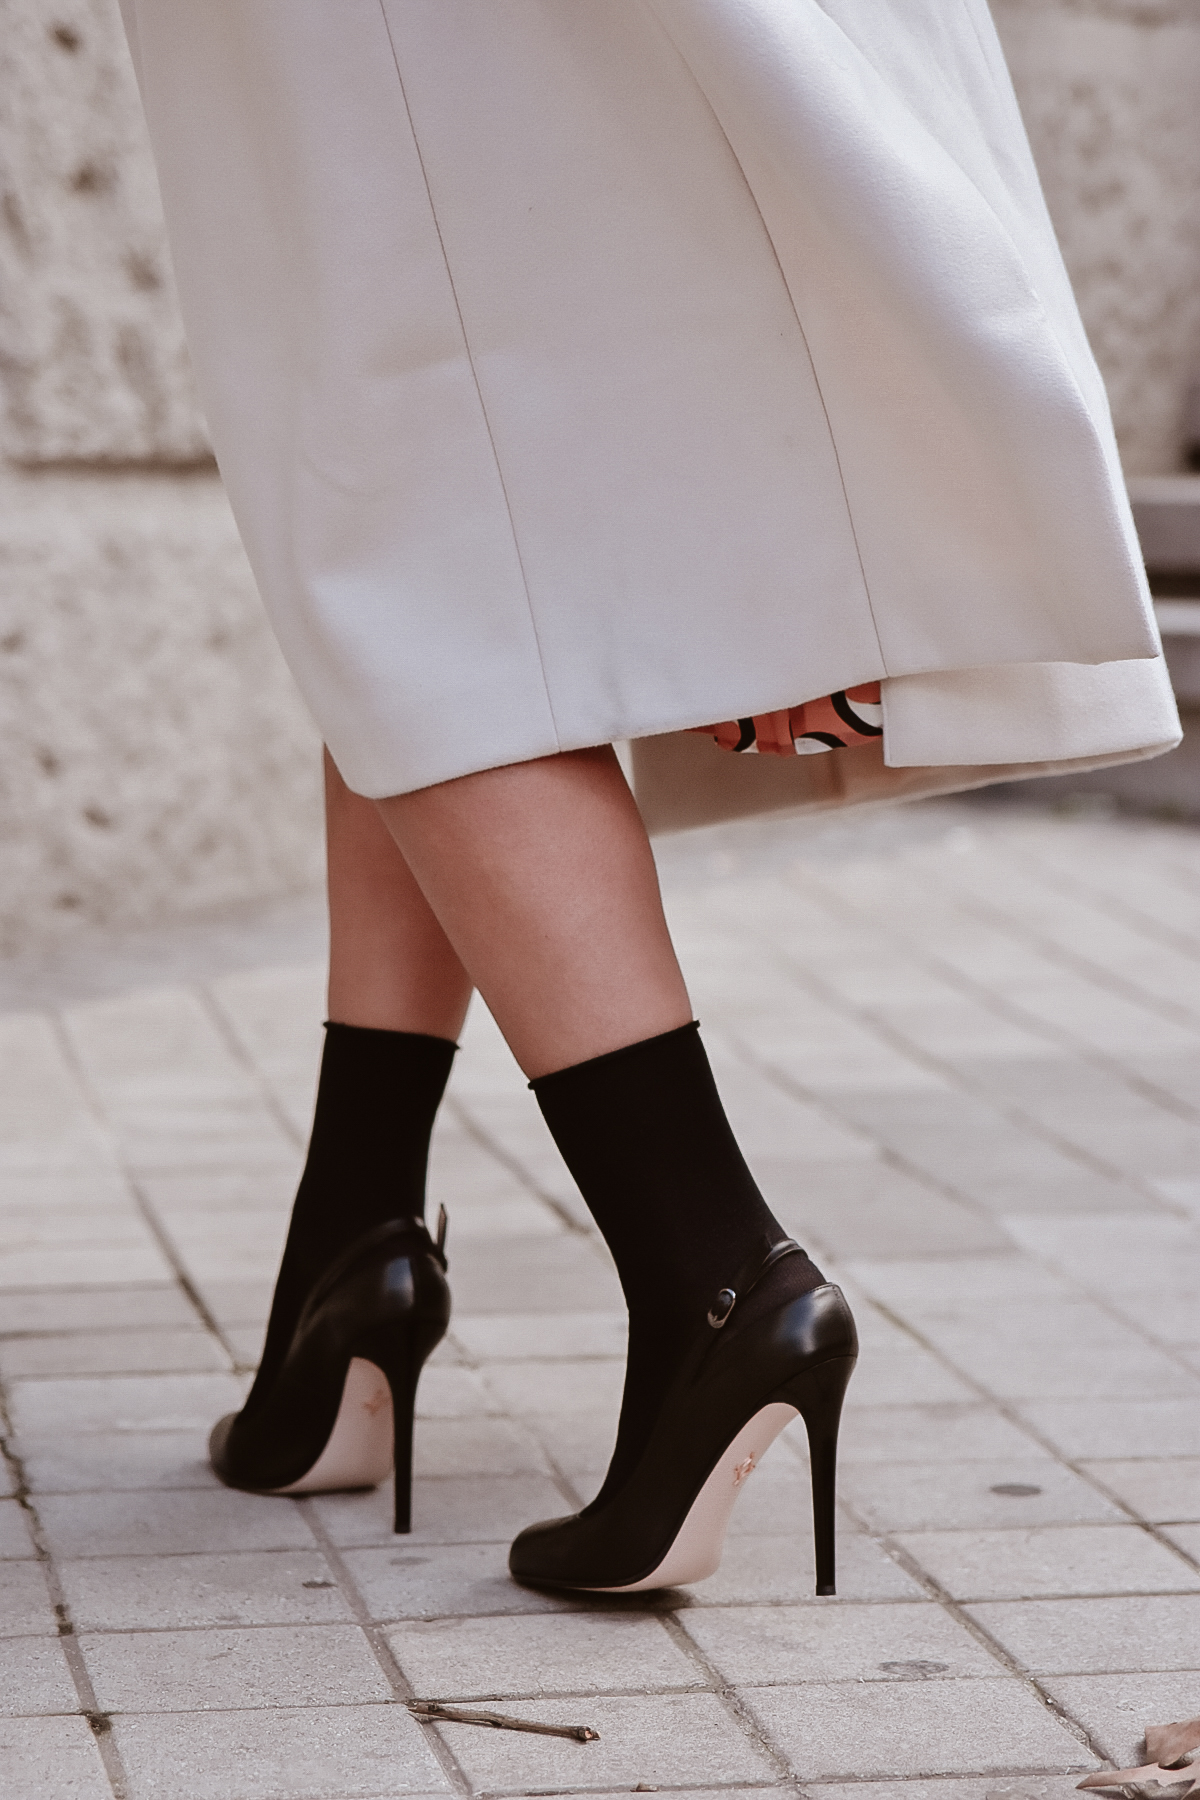 el-blog-de-silvia-look-femenino-vestido-midi-estampado-geometrico-06